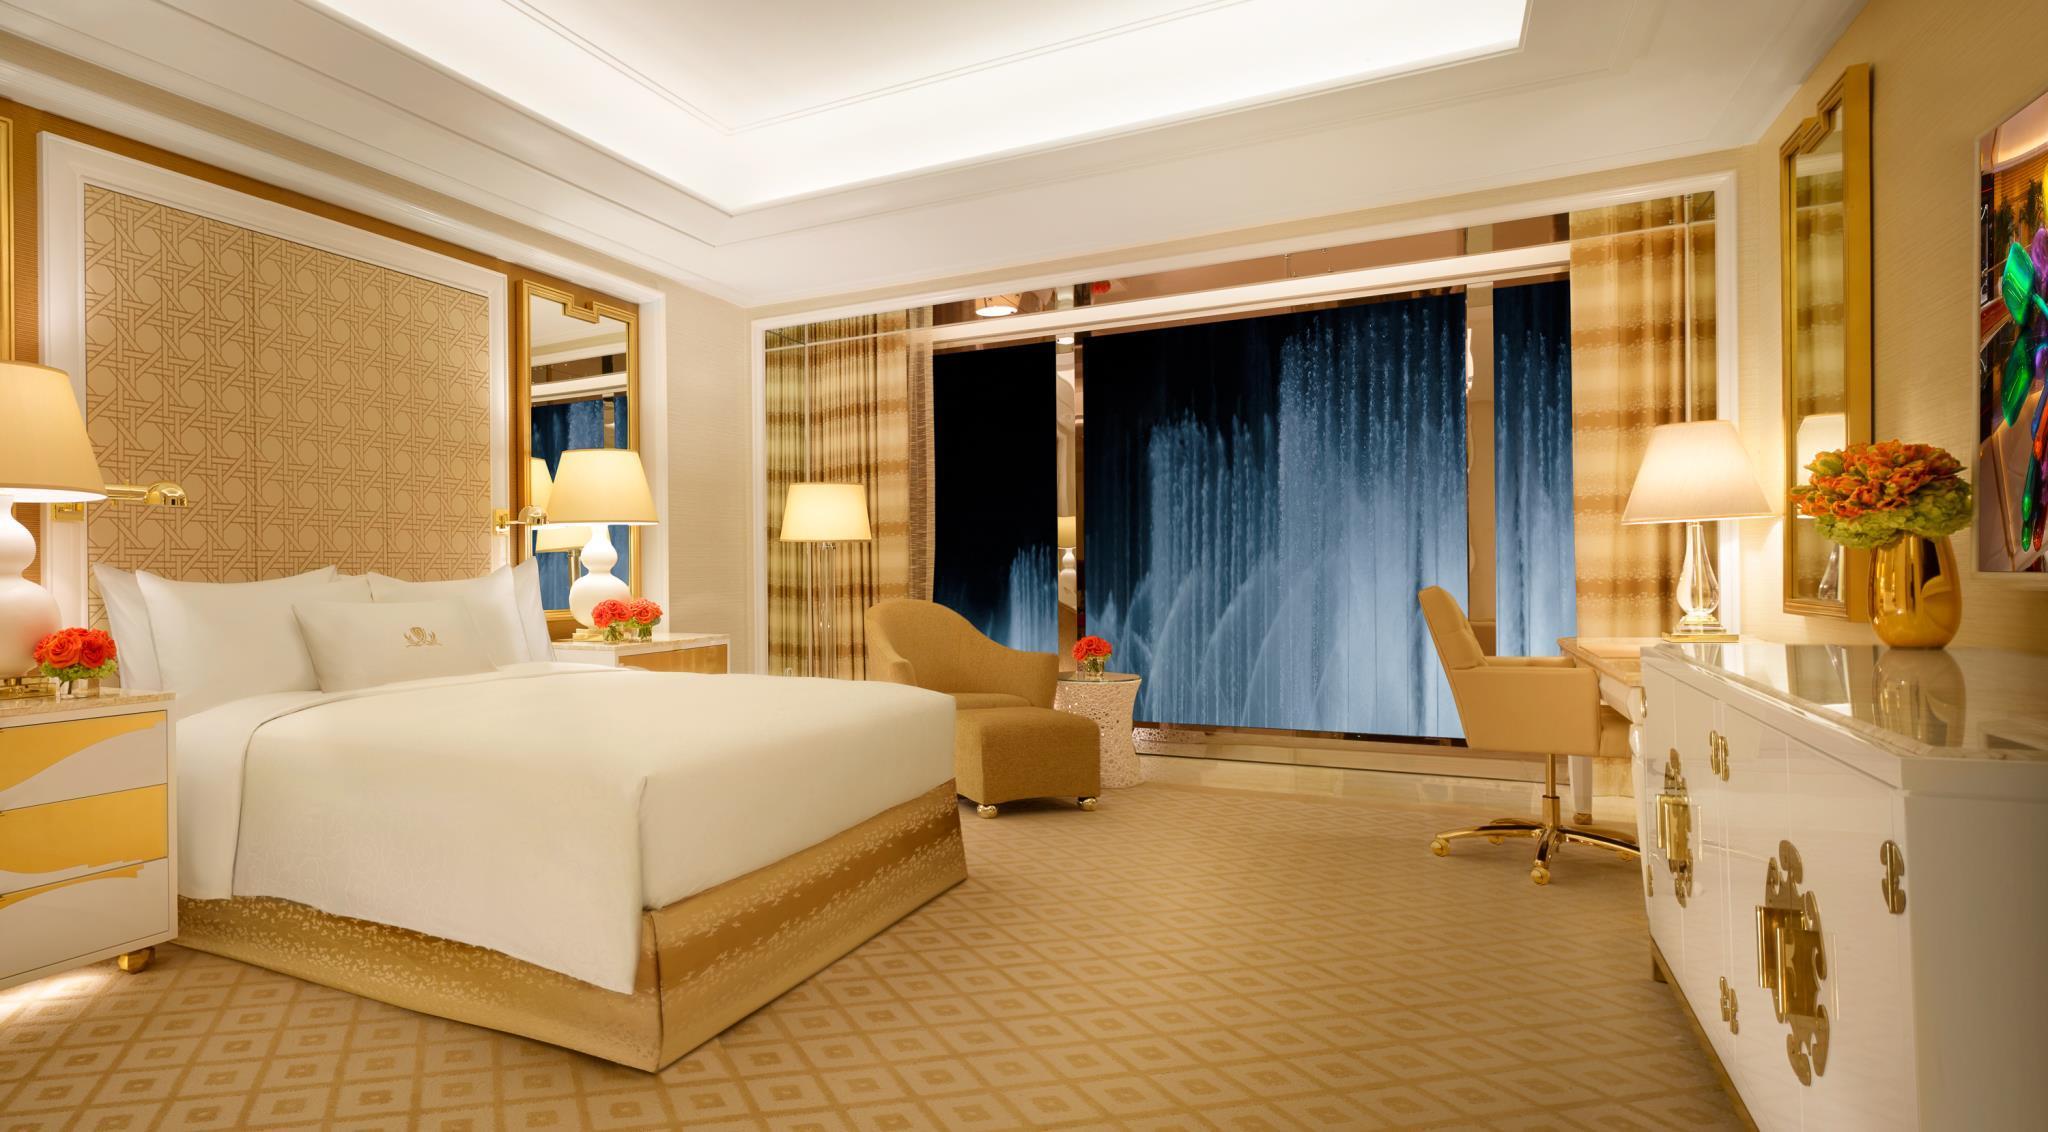 Wynn Palace Resort (Macau) - Deals, Photos & Reviews